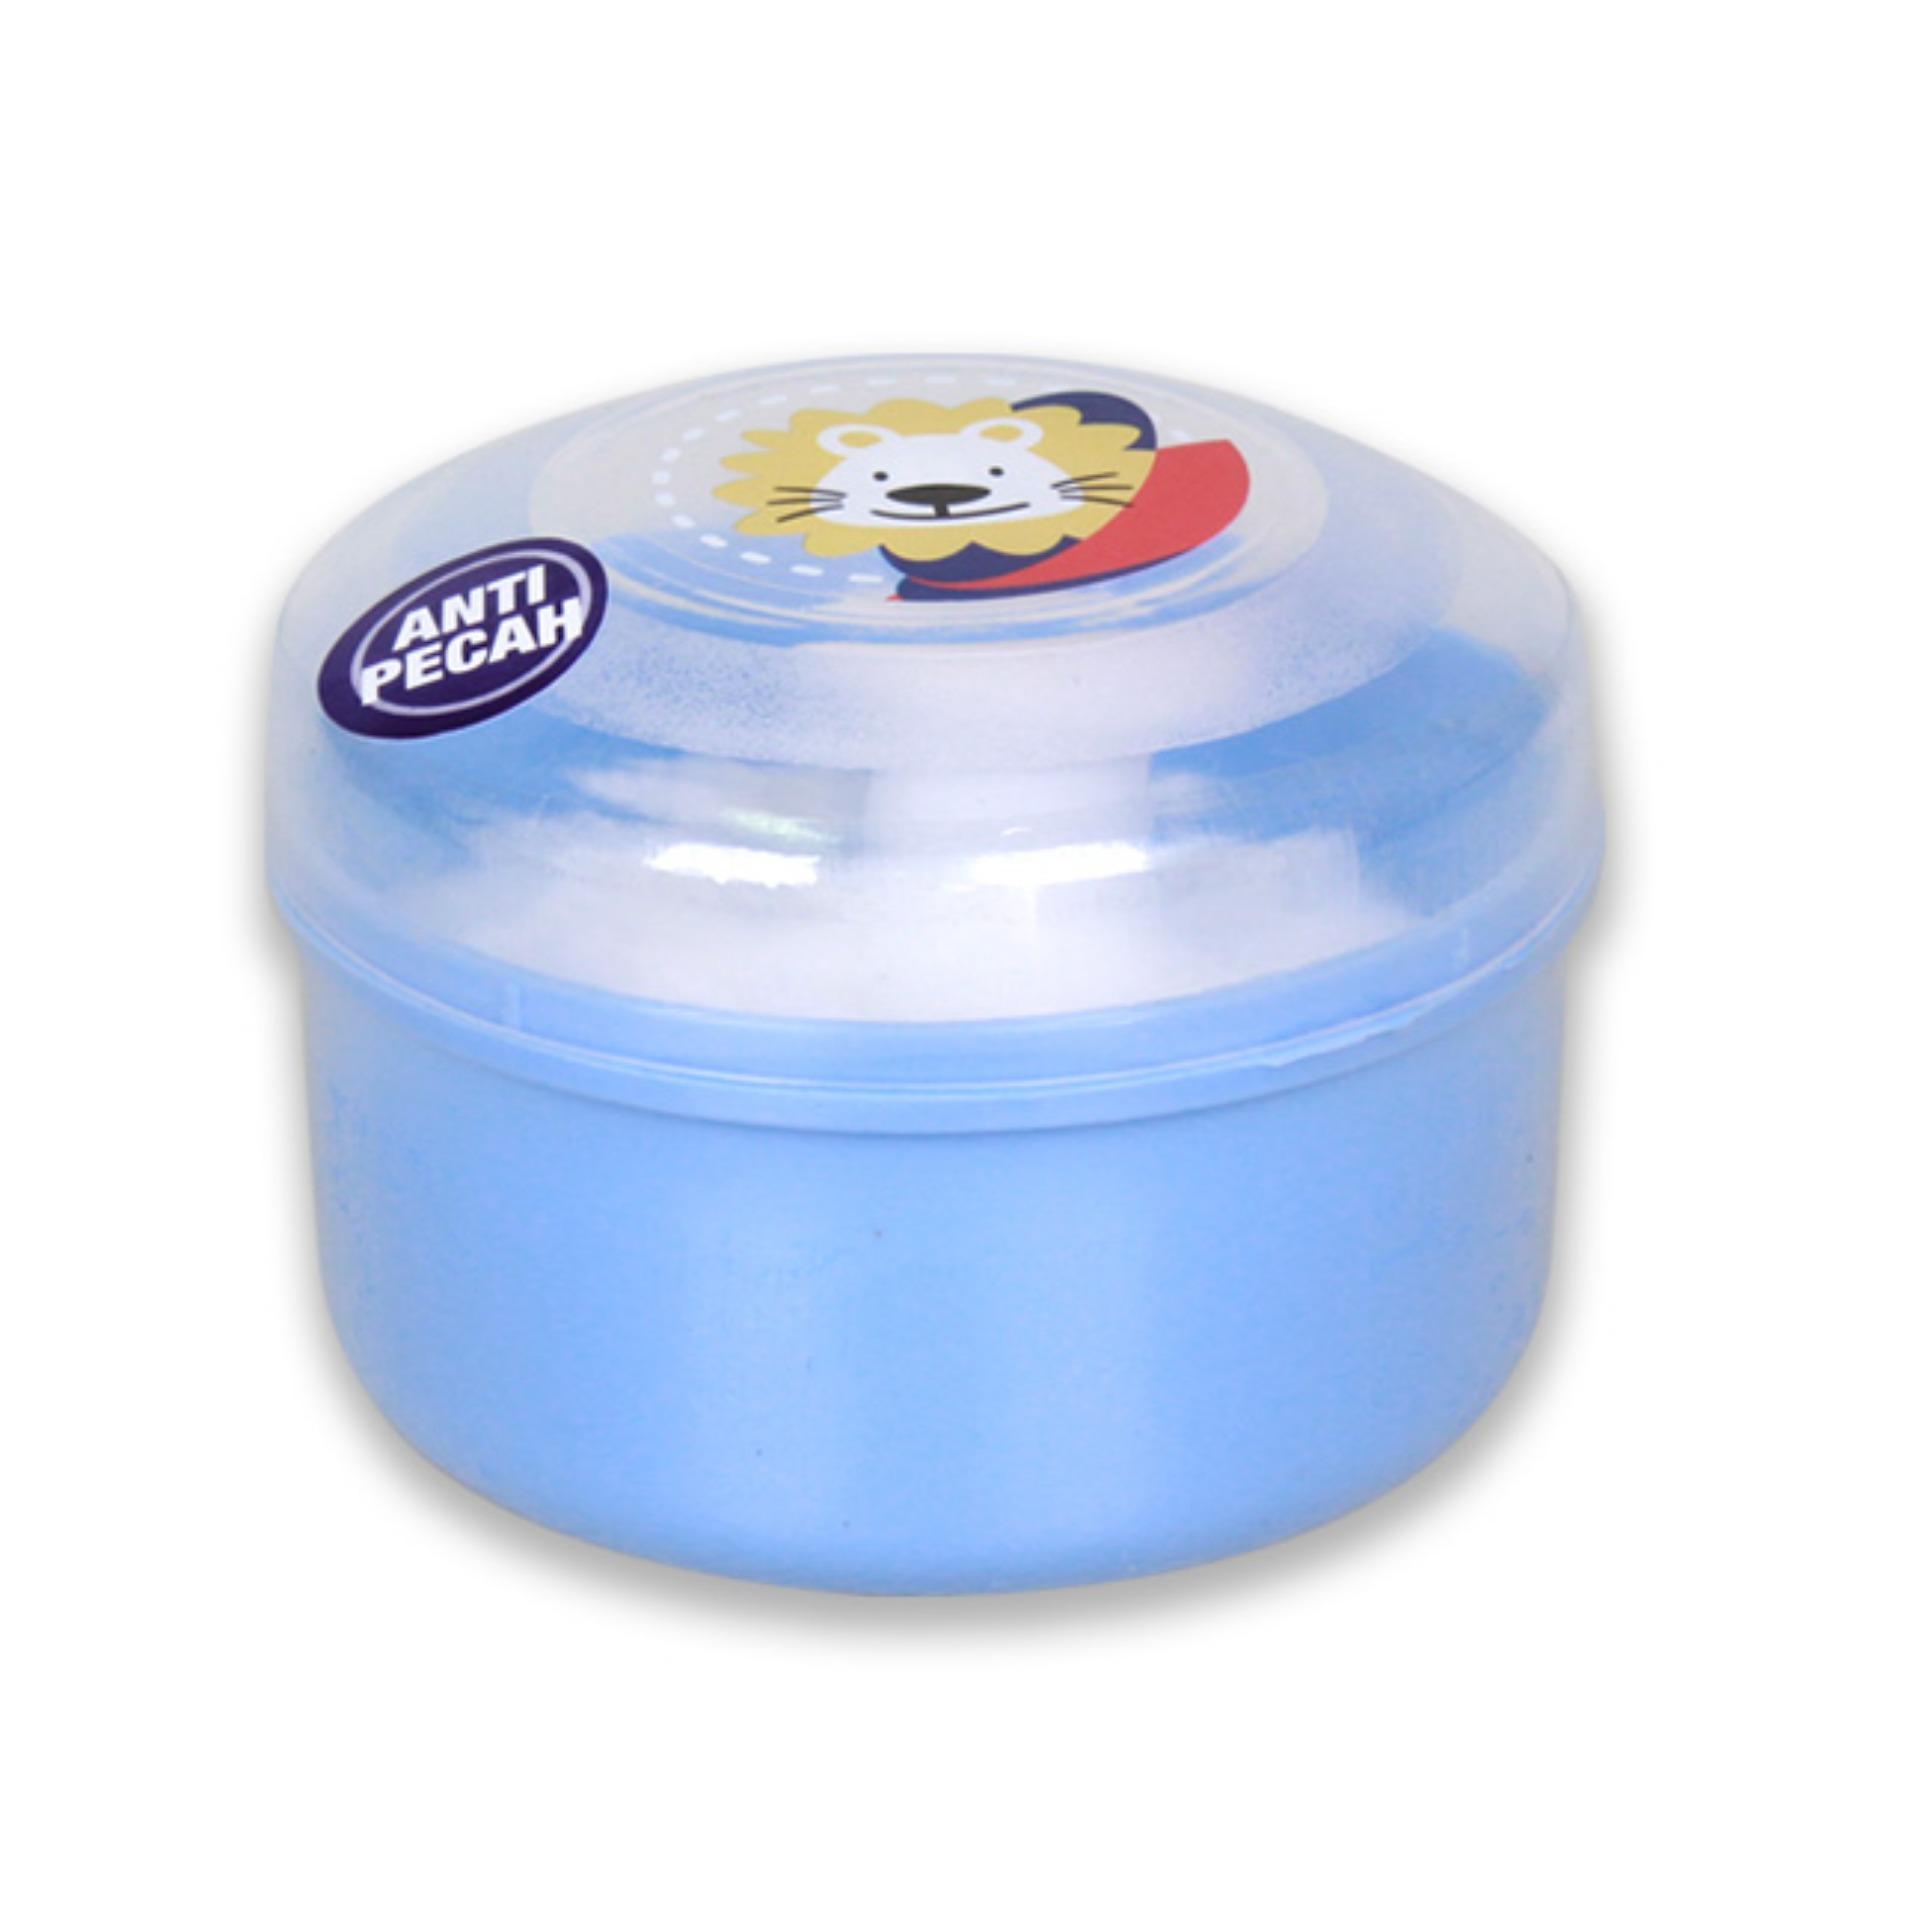 Lusty Bunny Baby Powder Case Pink Oval Tb 1530 Tempat Bedak Bayi Plus Soap Biru Muda Jual